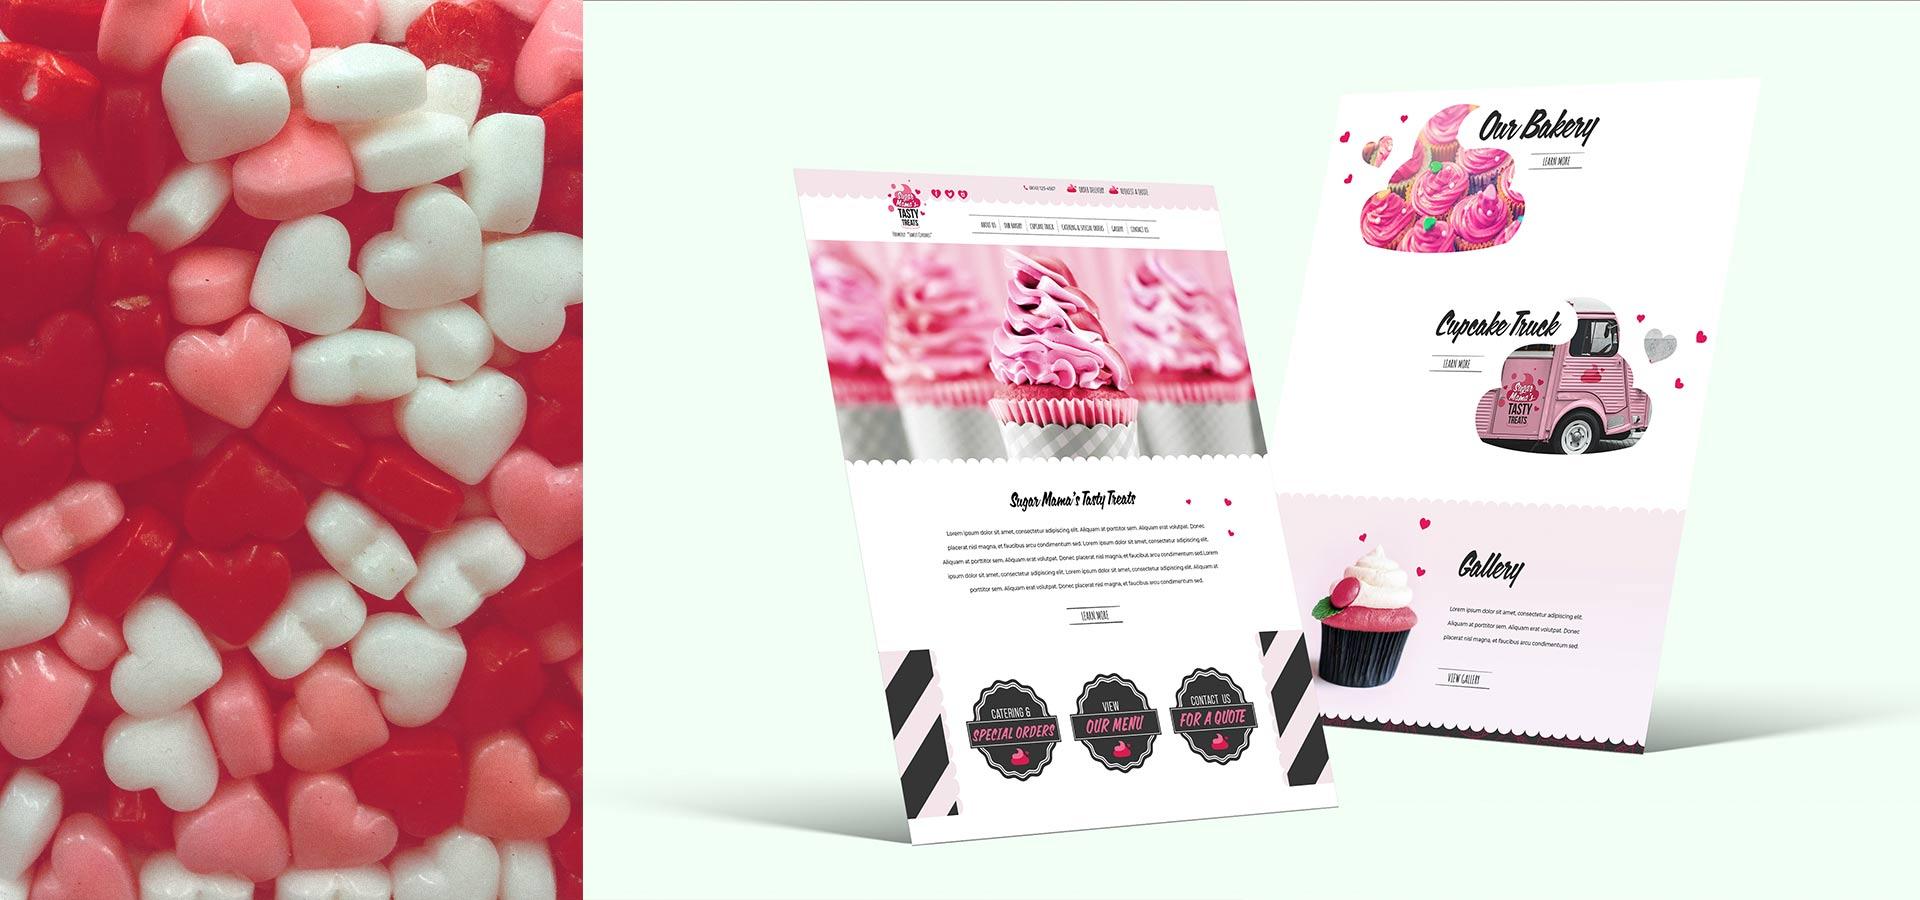 cupcake bakery website design